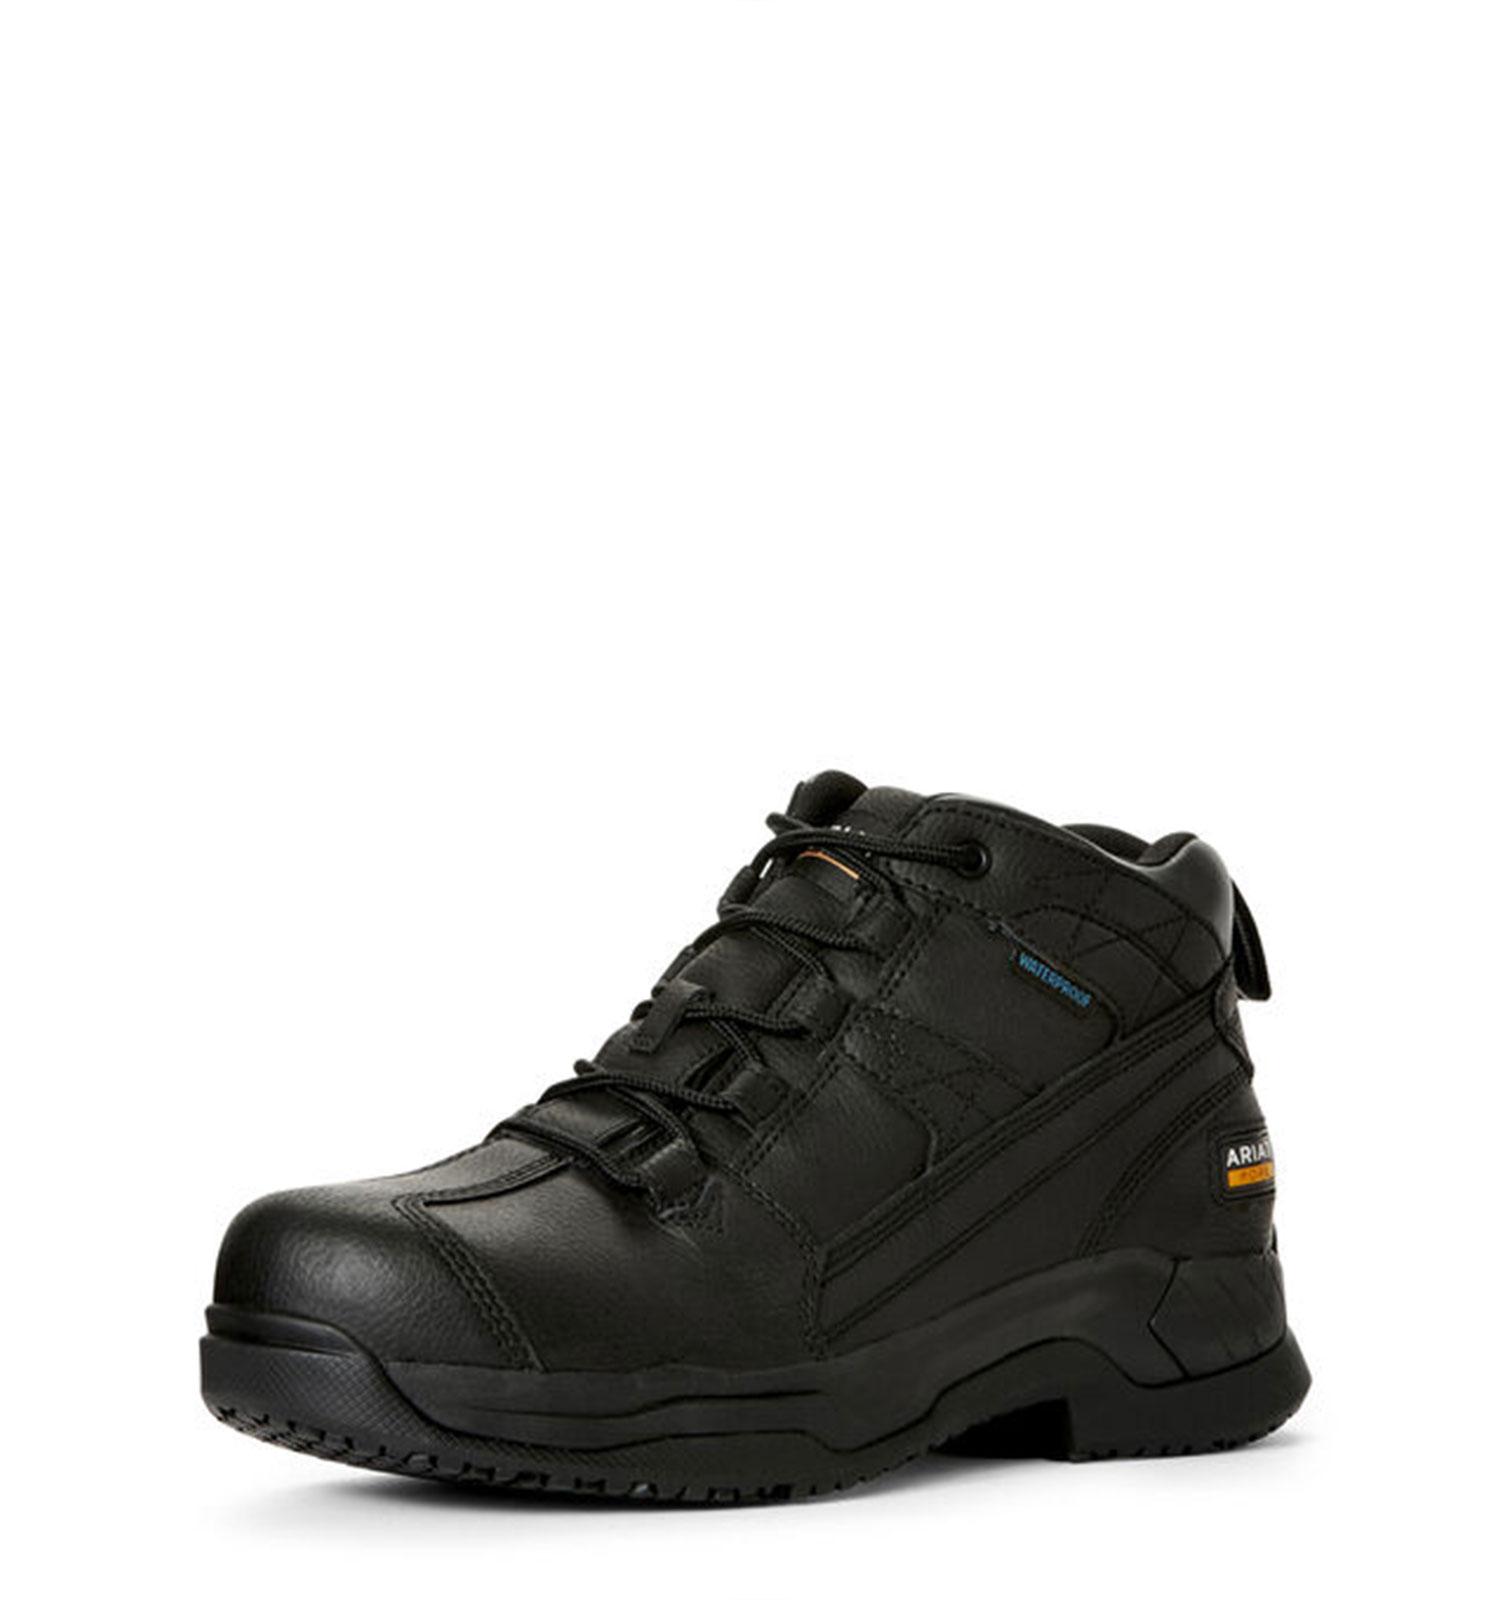 Ariat-Contender-Waterproof-Steel-Toe-Work-Boot--Black-Front-Side